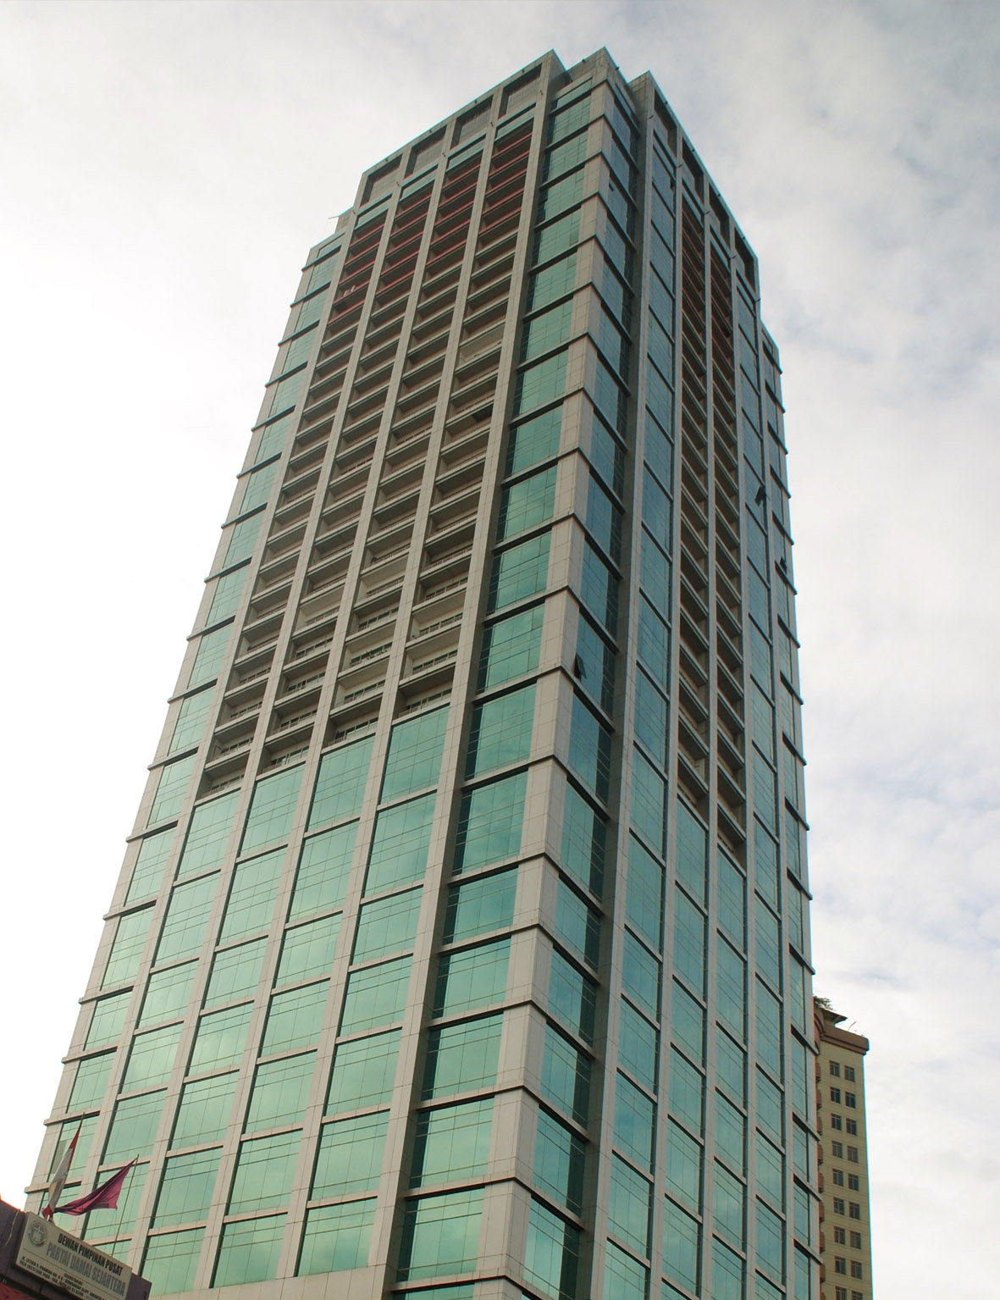 Grand Slipi Tower - Jl S Parman Kav 22 - 24 - Slipi - West Jakarta